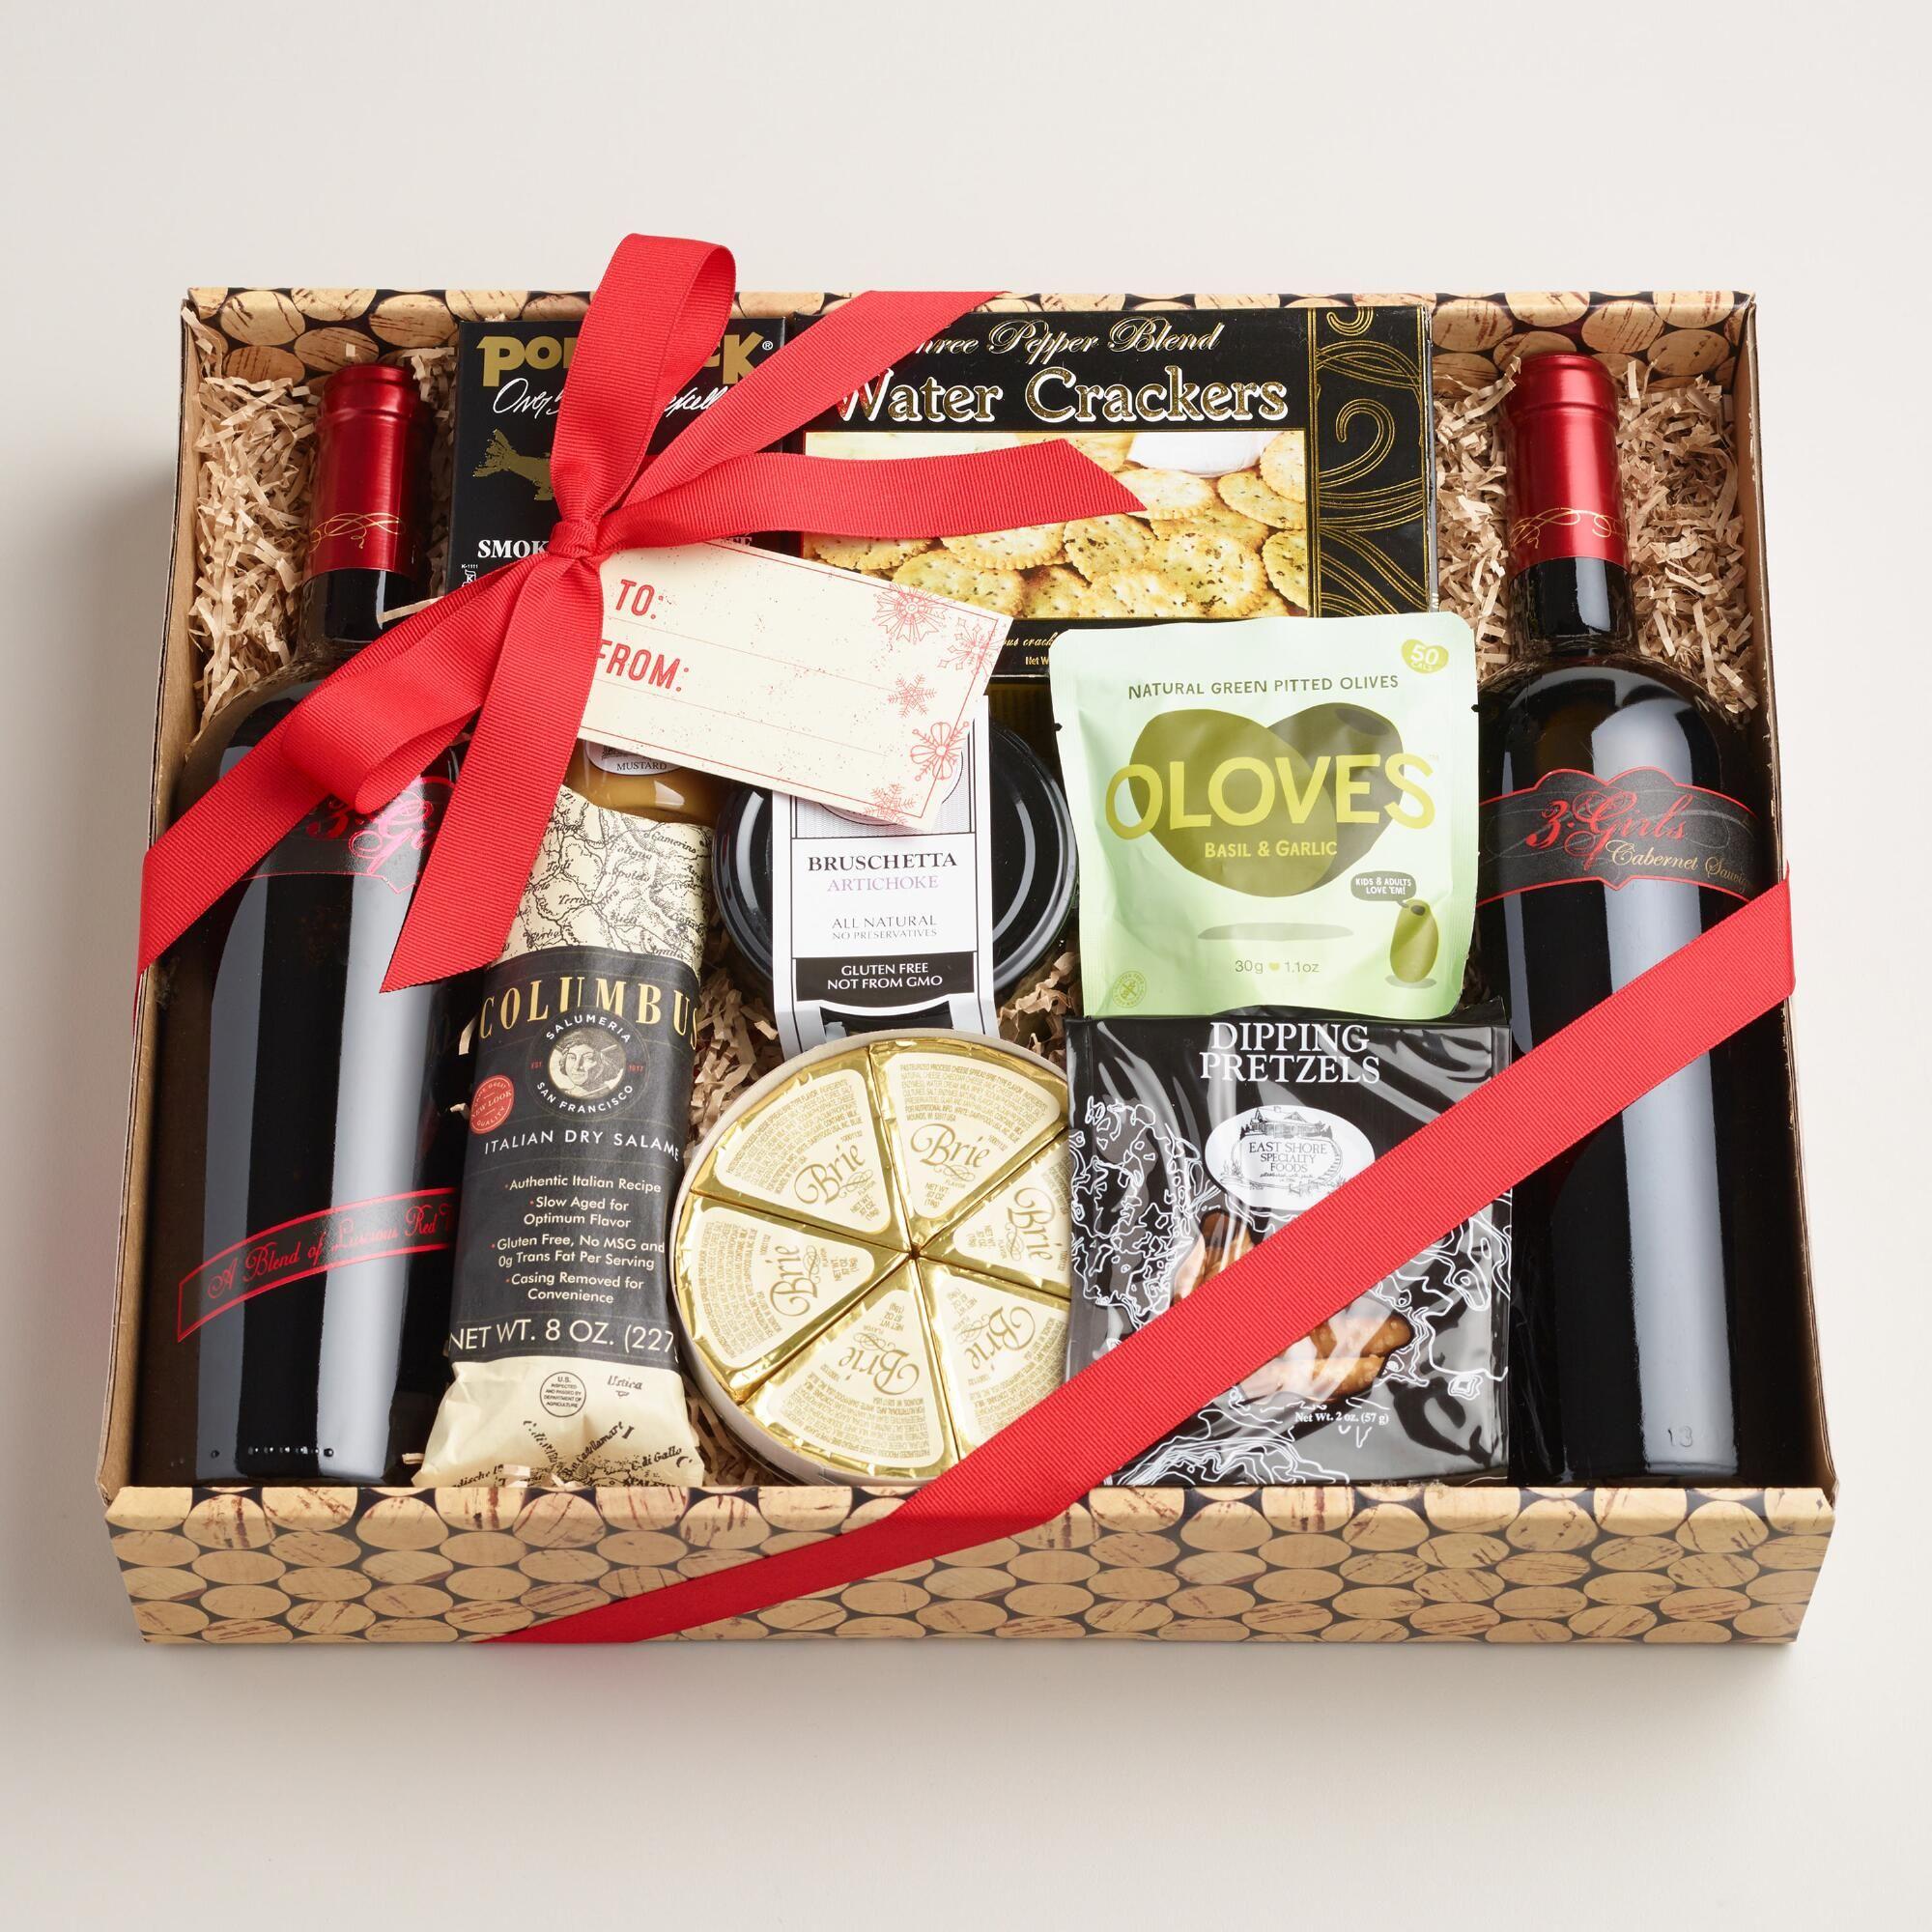 Savory Two Bottle Wine Basket Wine Baskets Valentine S Day Gift Baskets Basket